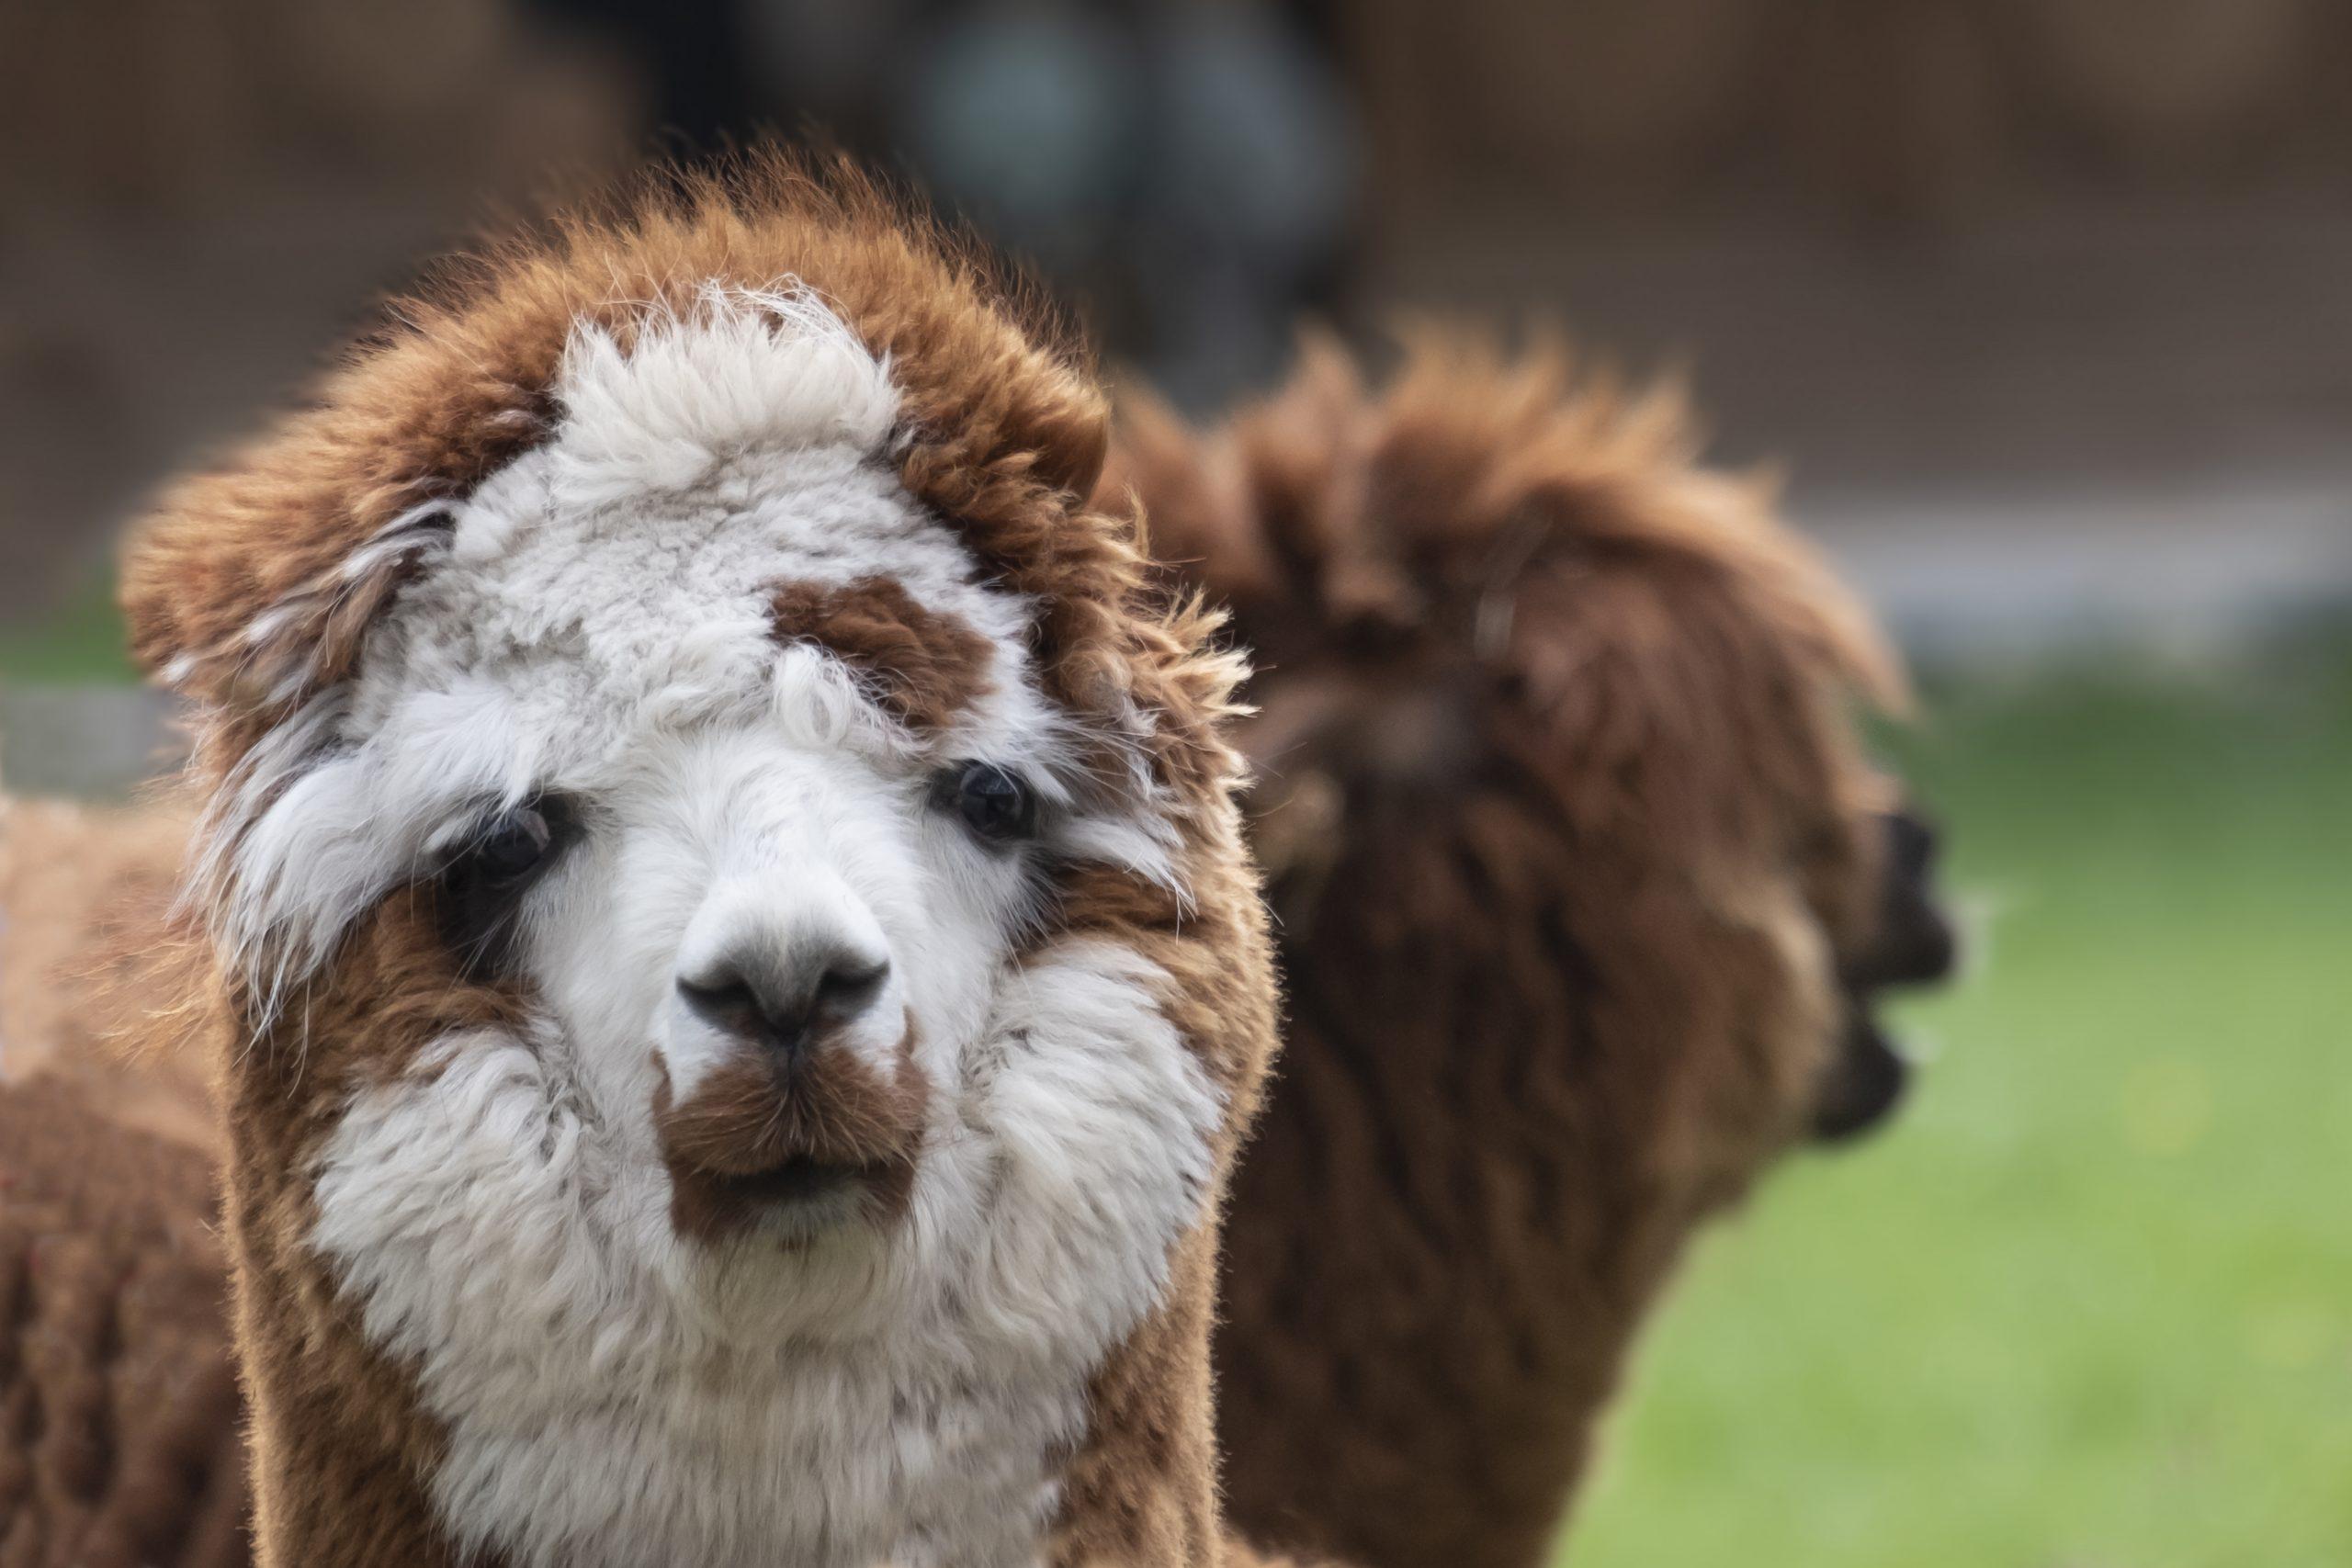 Close-Up Portrait Of A Alpaca On Field